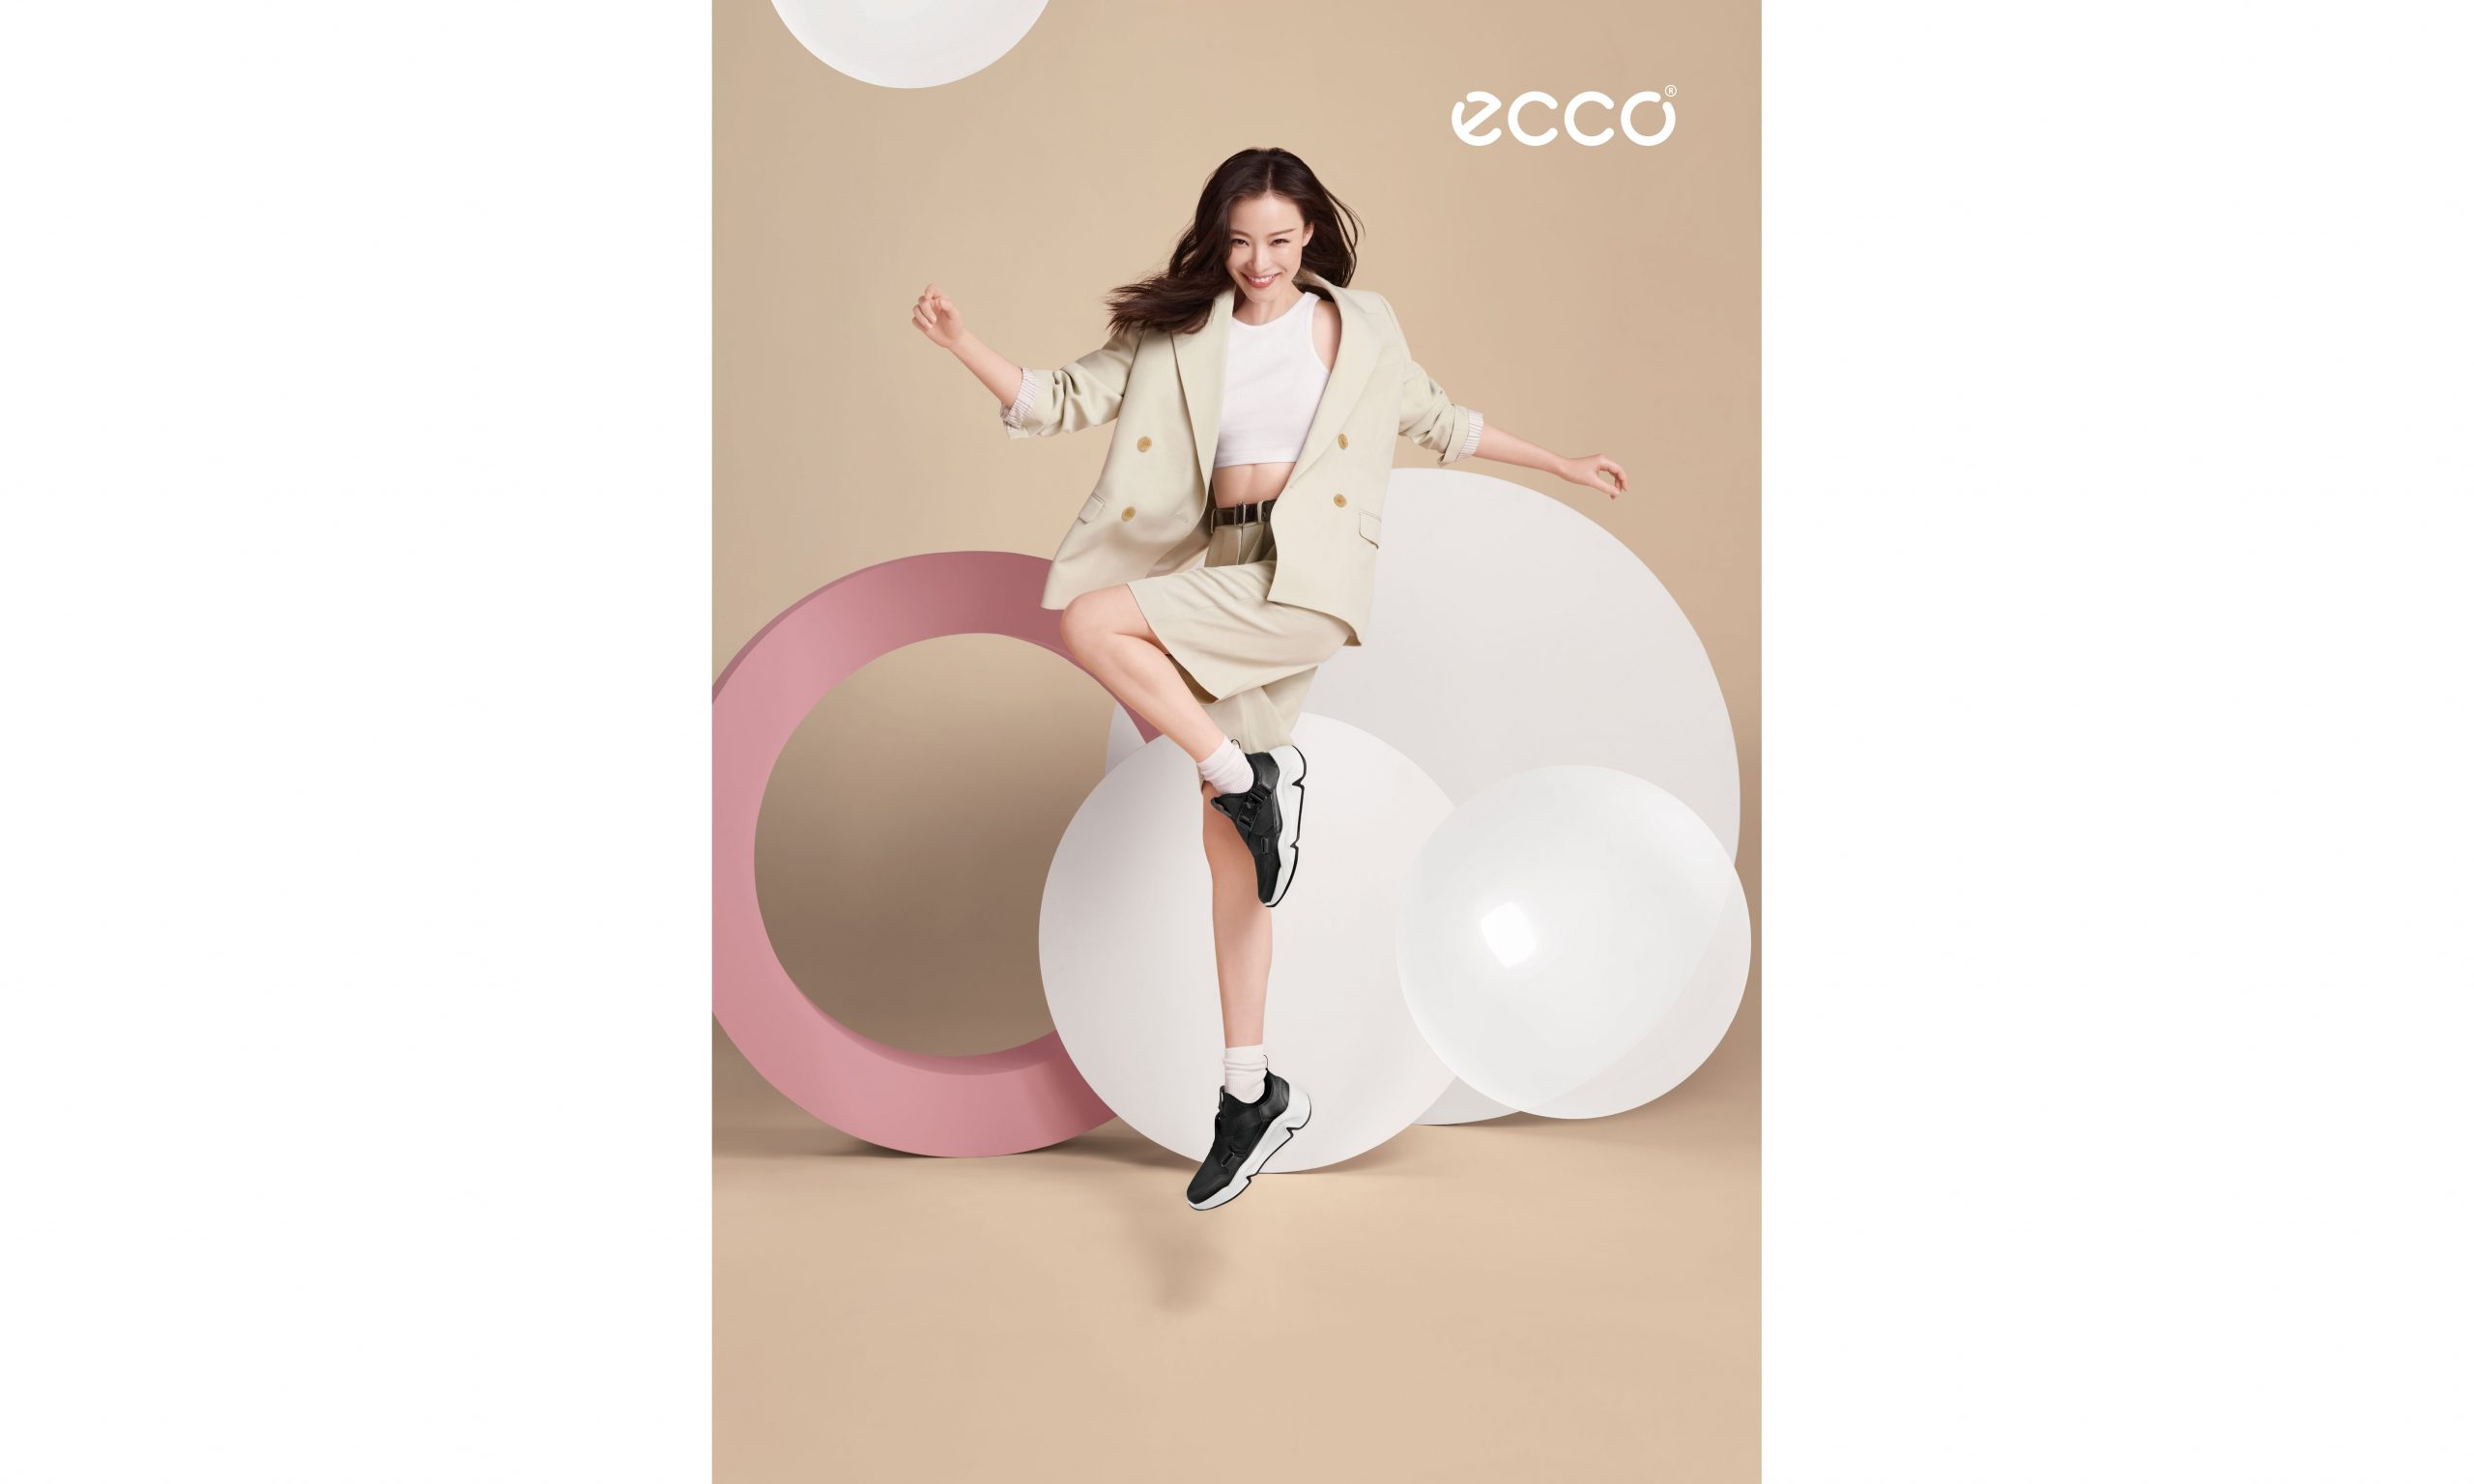 ECCO 官宣全新代言人倪妮